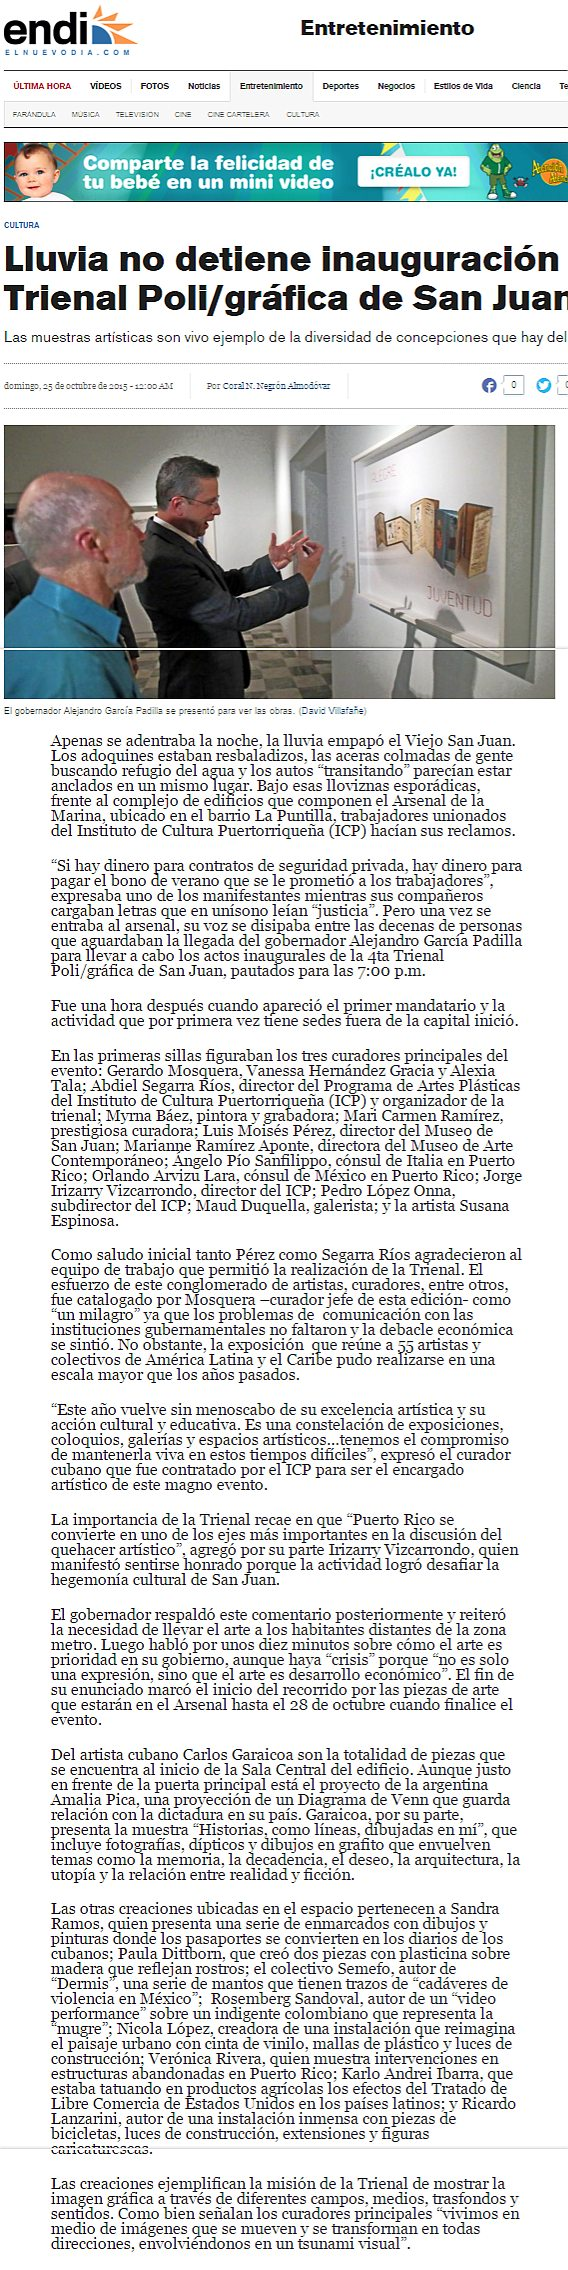 Inaugura la Trienal Poligráfica-Trienal-entrevista